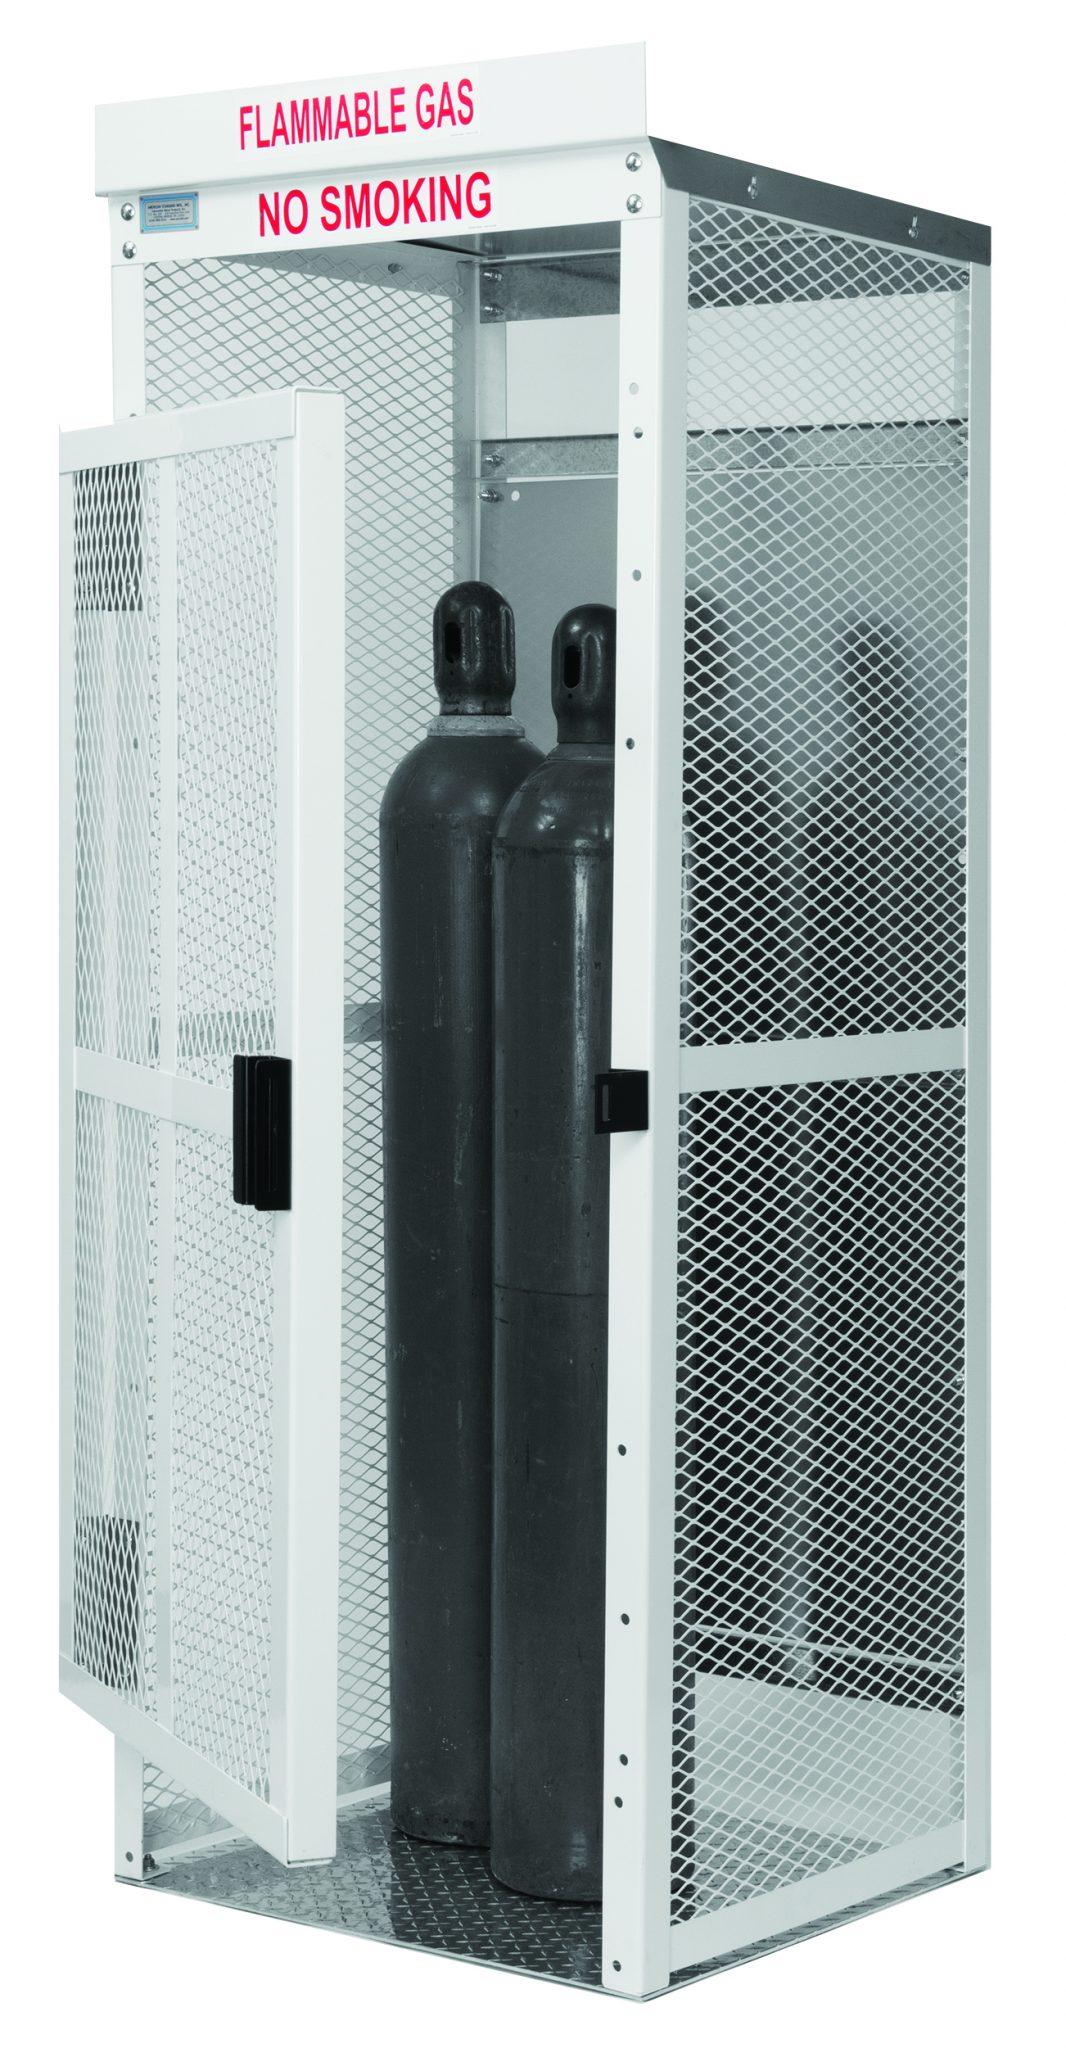 High Pressure Oxygen, welding gas eight tank steel gas cage.